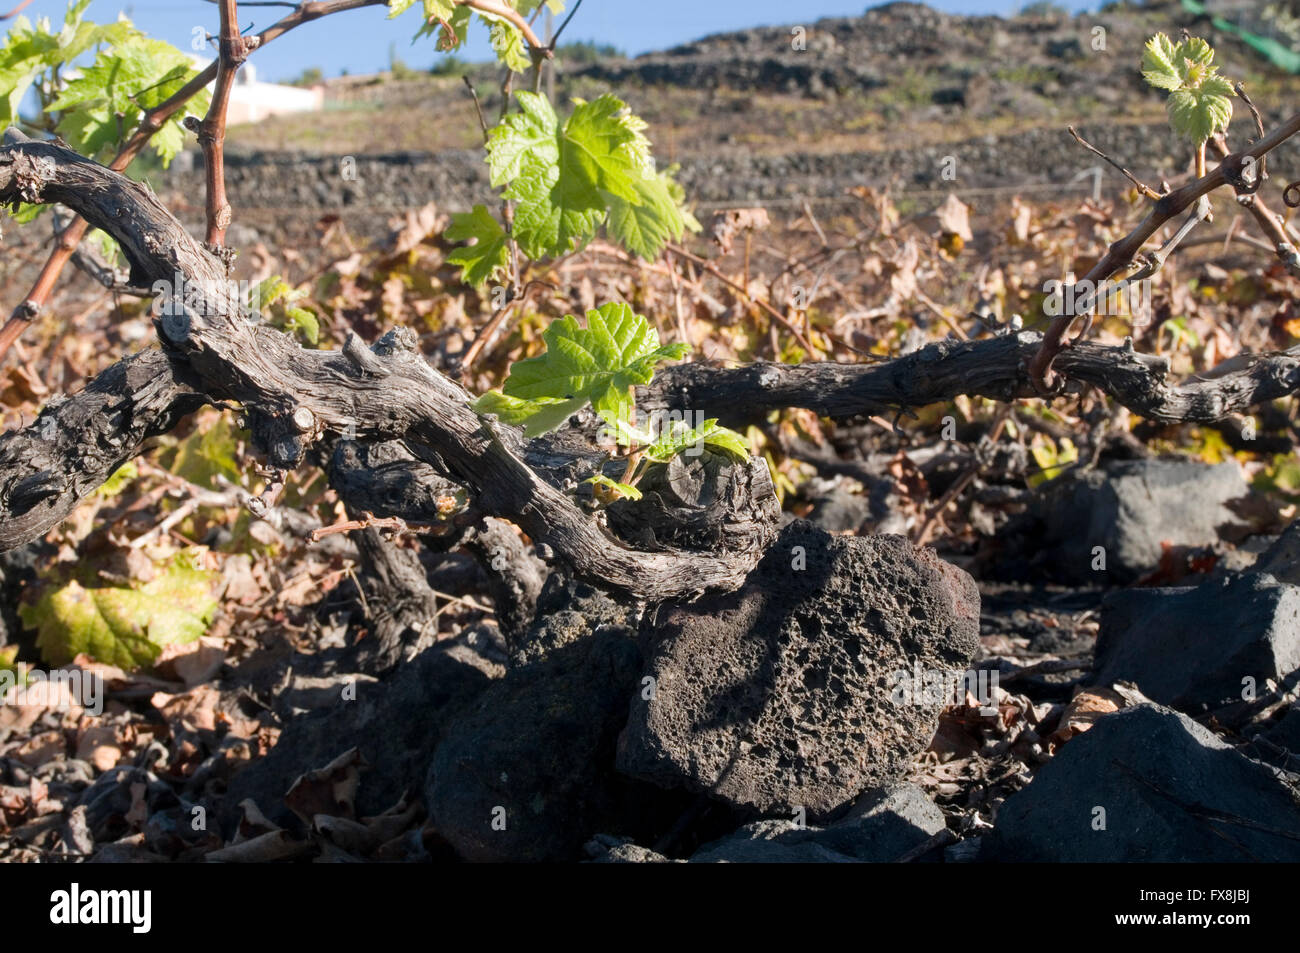 grape vines grape vine grapevine grapevines vineyard vineyards canary islands island canaries isle isles low short - Stock Image